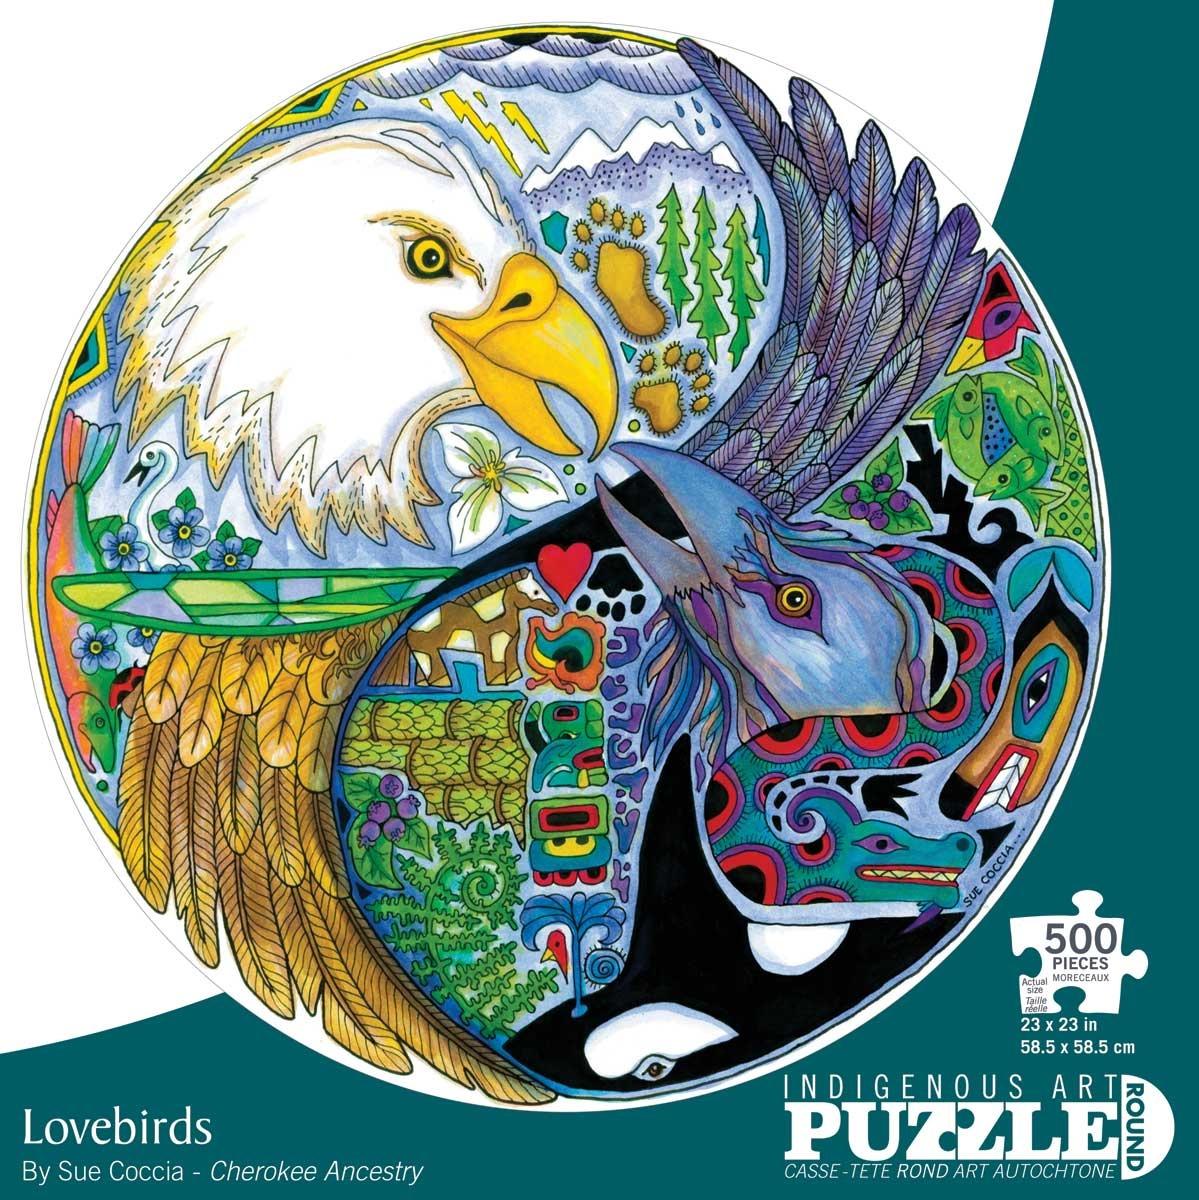 500 - Lovebirds (Sue Coccia)